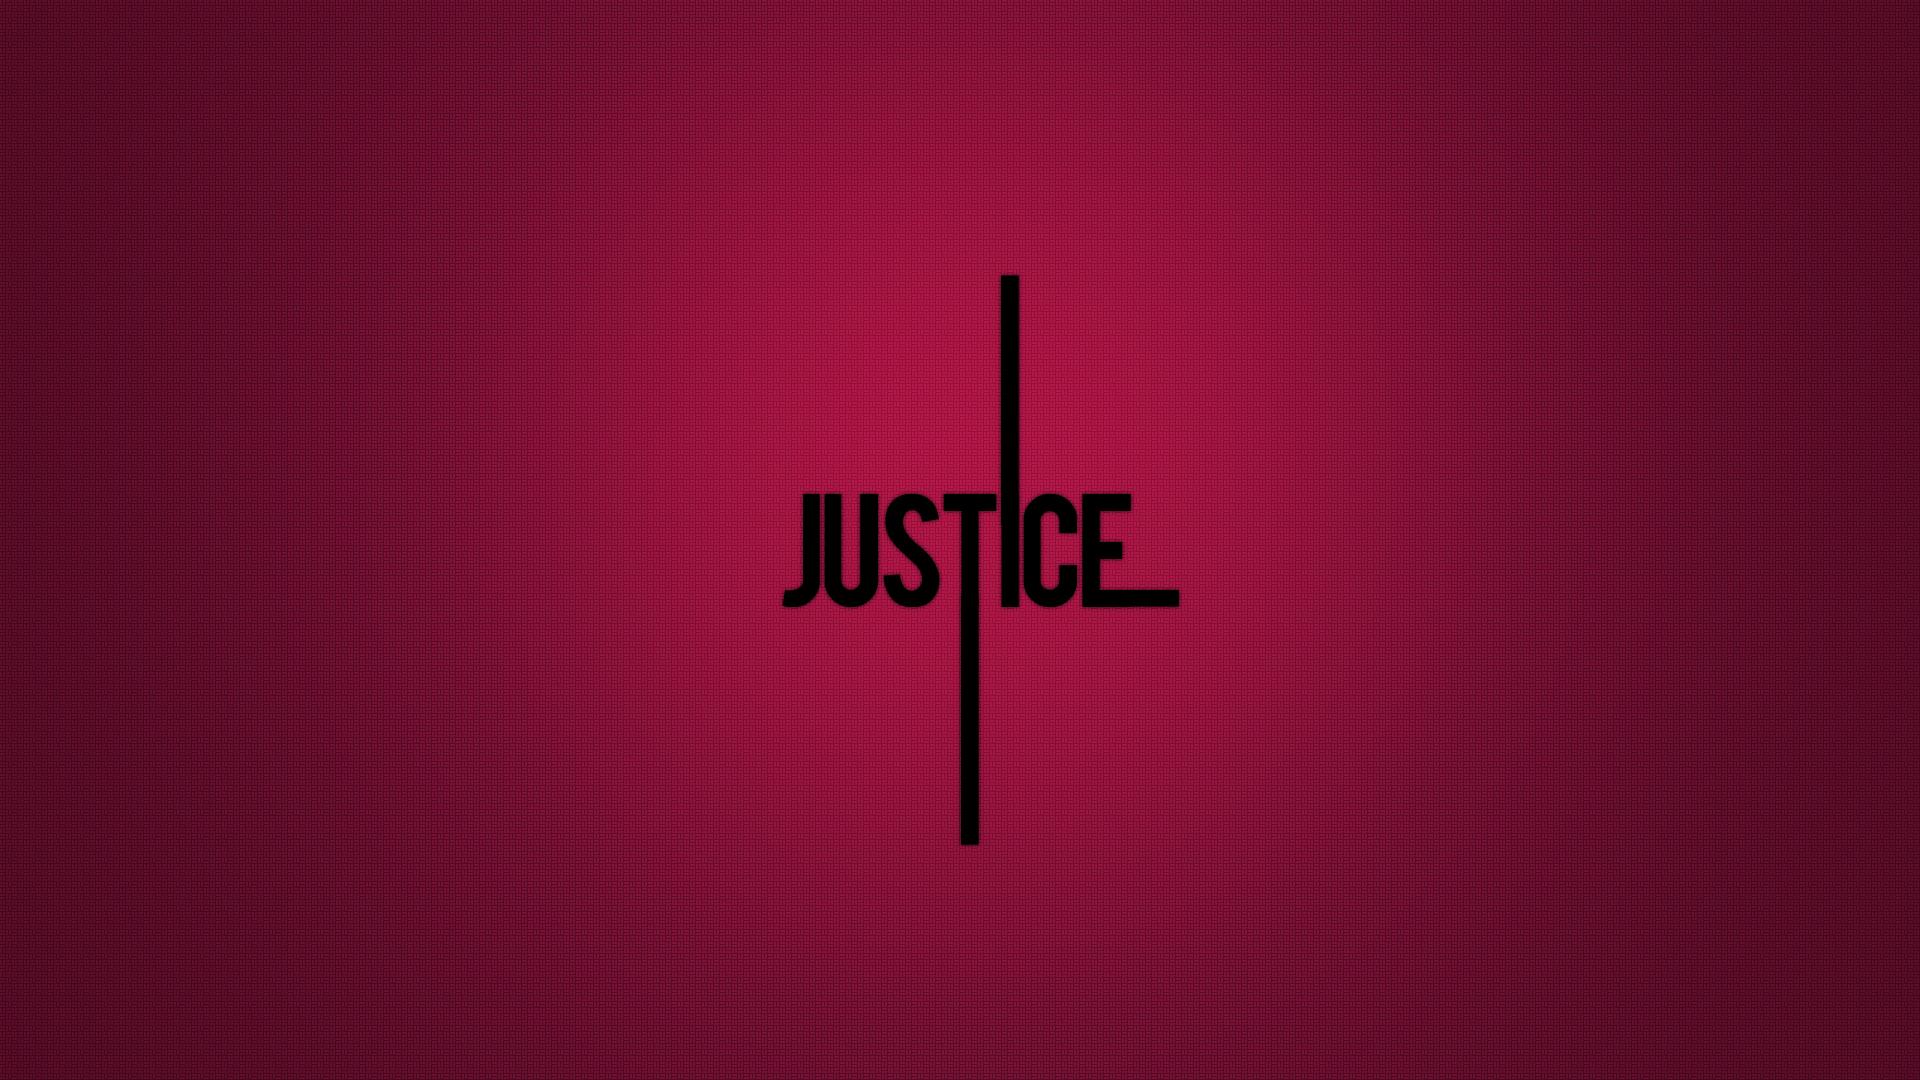 Justice pink by JusticeBleeds